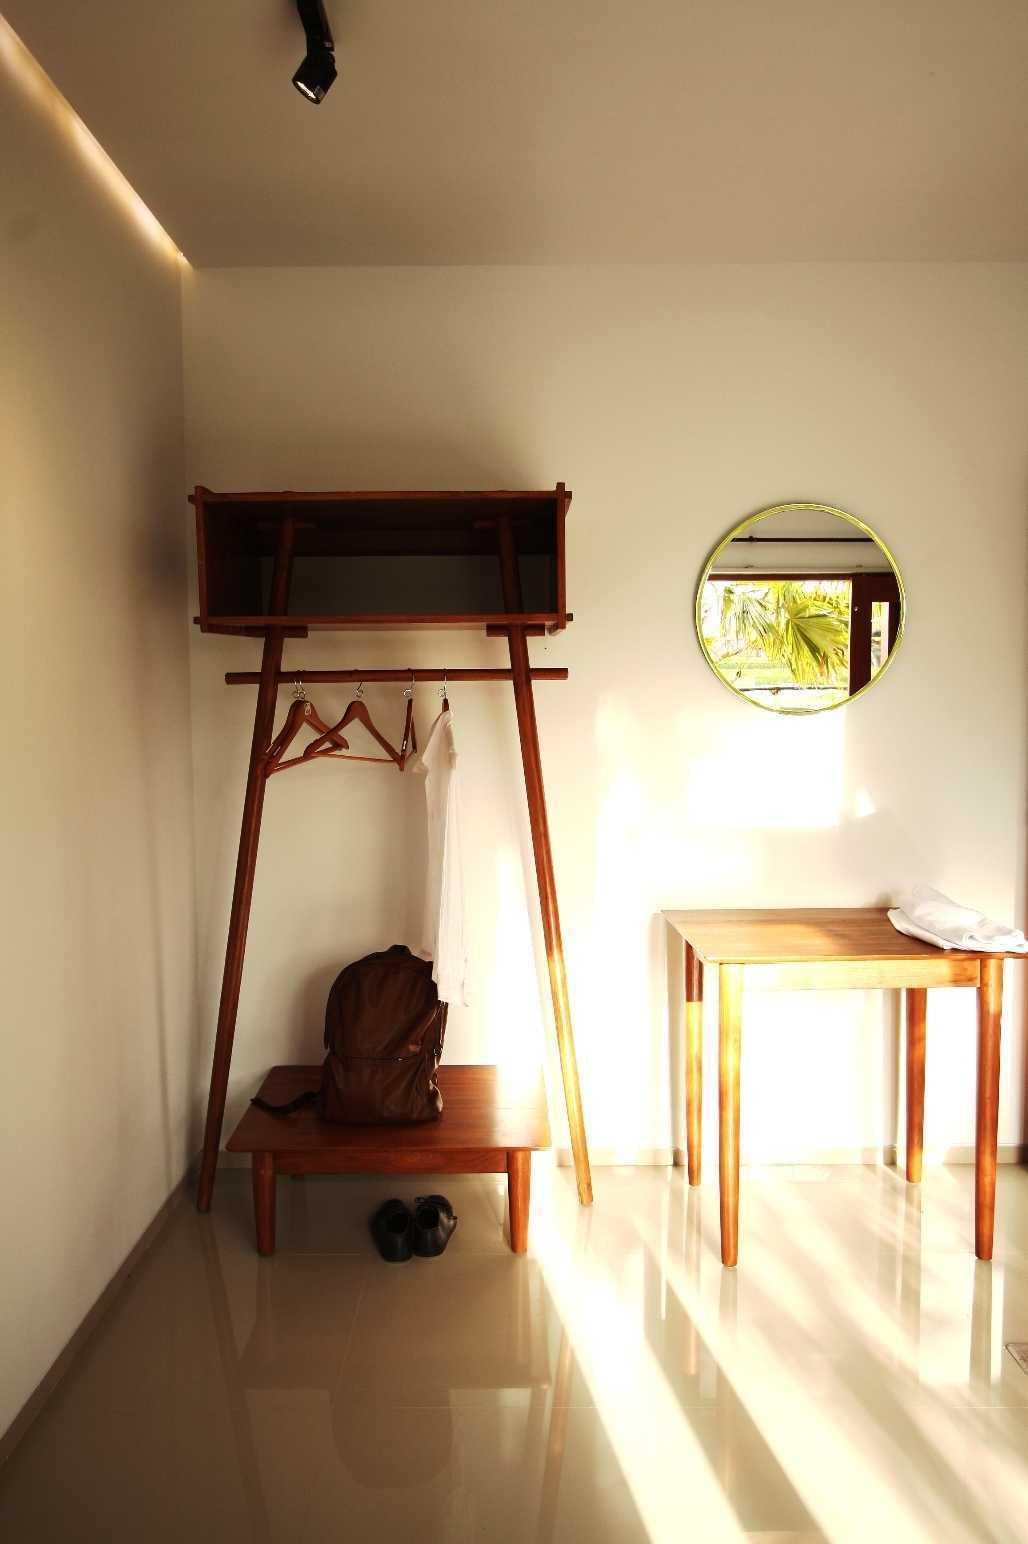 Ddap Architect Kubu Tropis Lodge Accommodation Ubud, Kabupaten Gianyar, Bali, Indonesia Bali Img0694 Tropis  28523